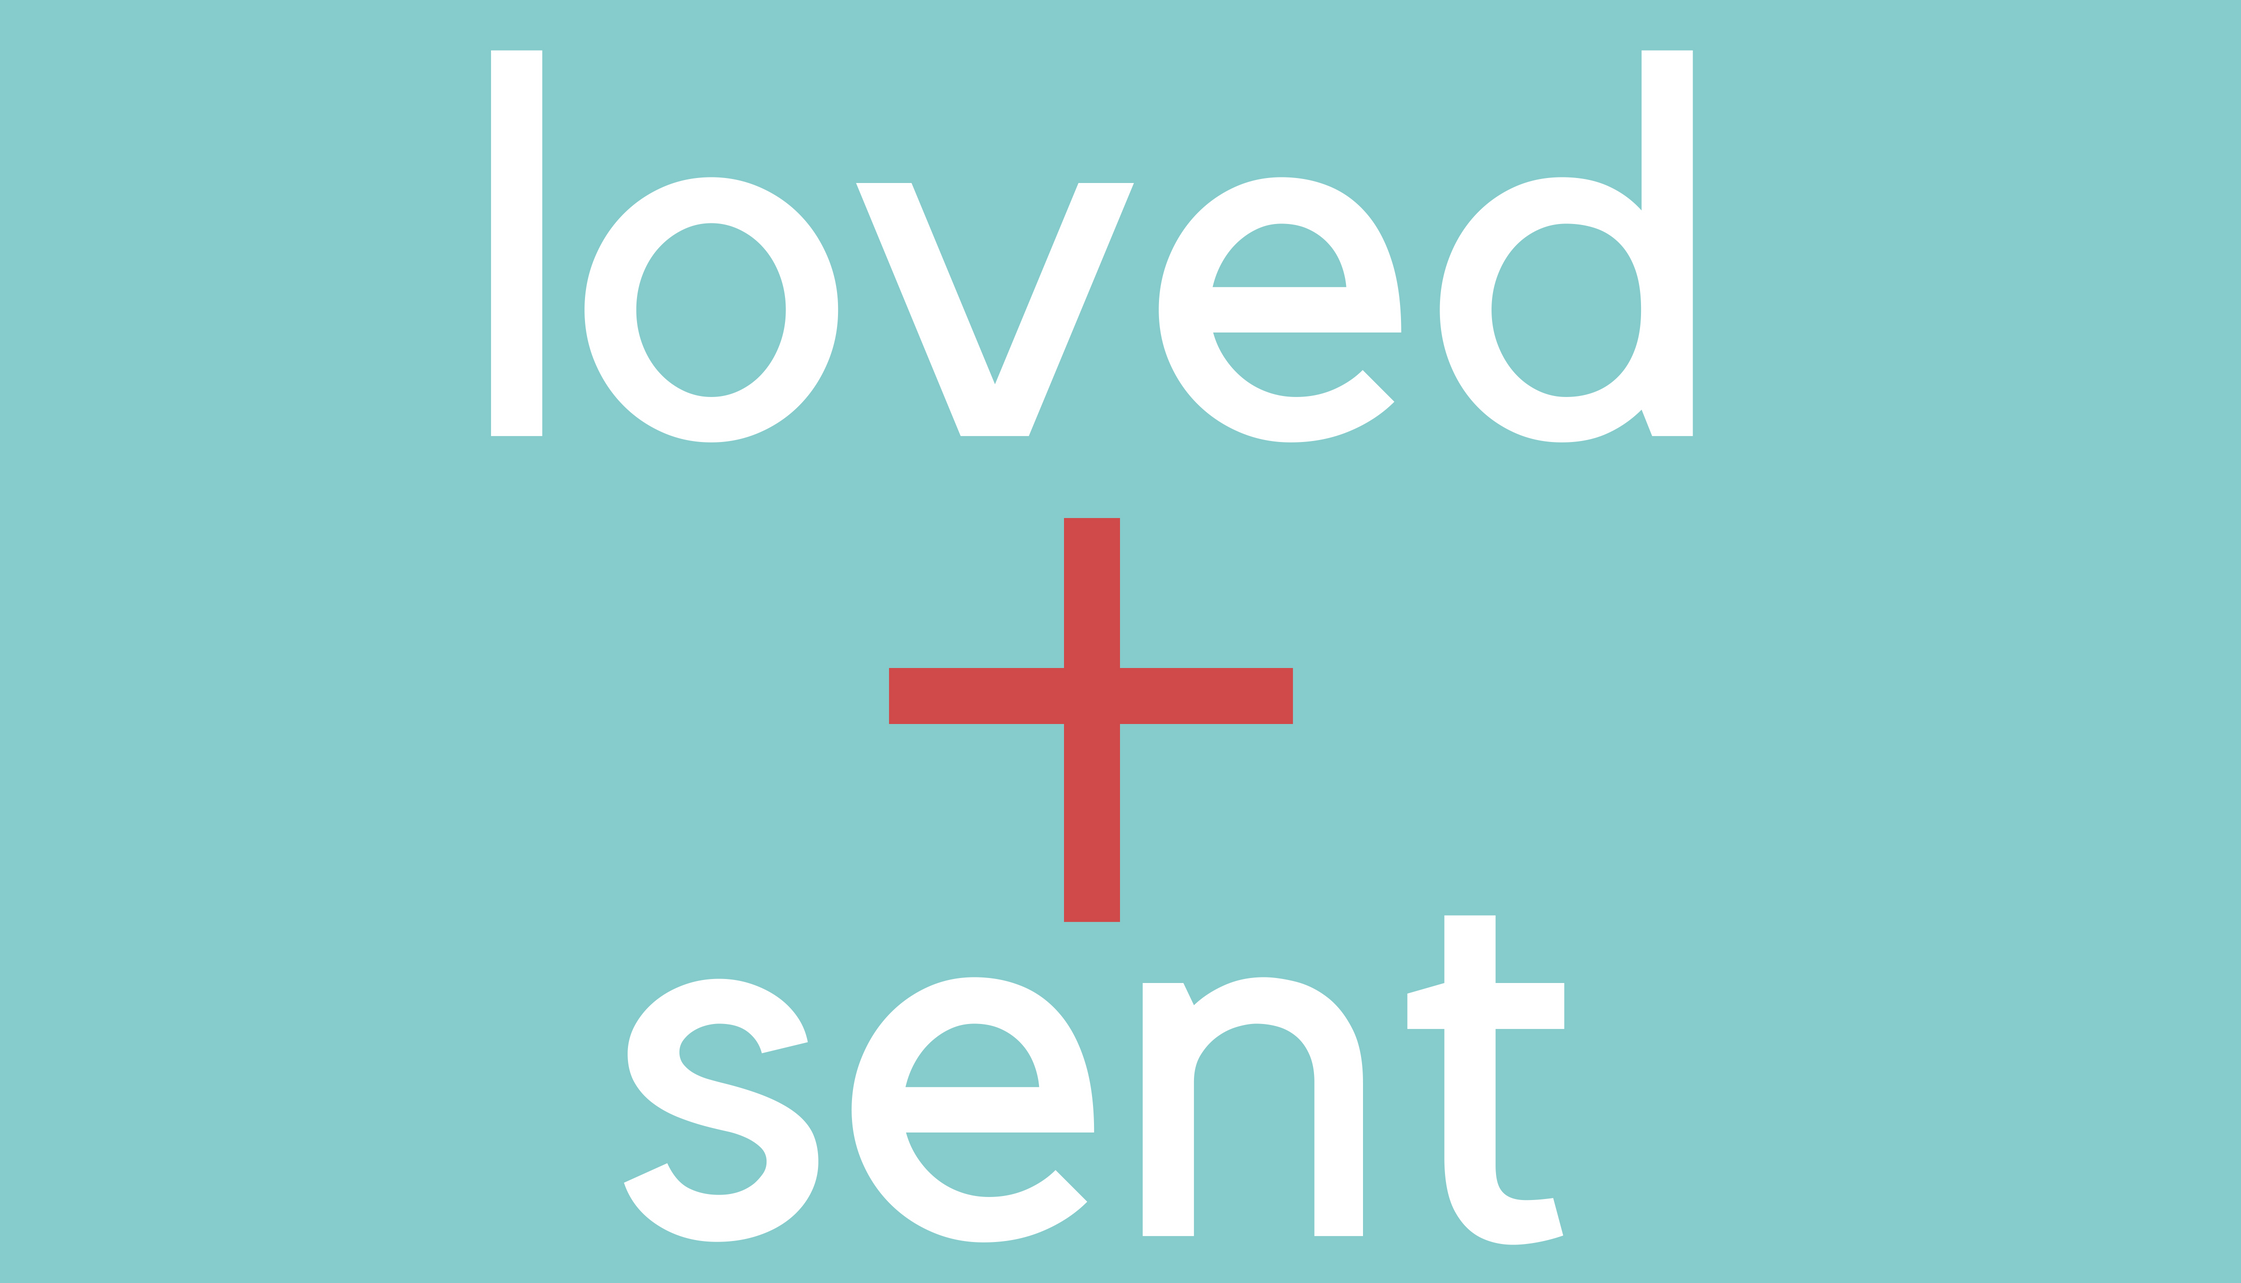 Loved + Sent - Week 1: Identity + Purpose // 1 John 4:7-12Week 2: Holy Spirit // Acts 8:26-39Week 3: Father // 1 John 2:28-3:3Week 4: Son // Mark 5:21-24Week 5: Who Am I? // 1 Corinthians 12:12-26Week 6: Love // 1 John 3Week 7: Calling // Genesis 1:28-31Week 8: Sent // Isaiah 6:1-10